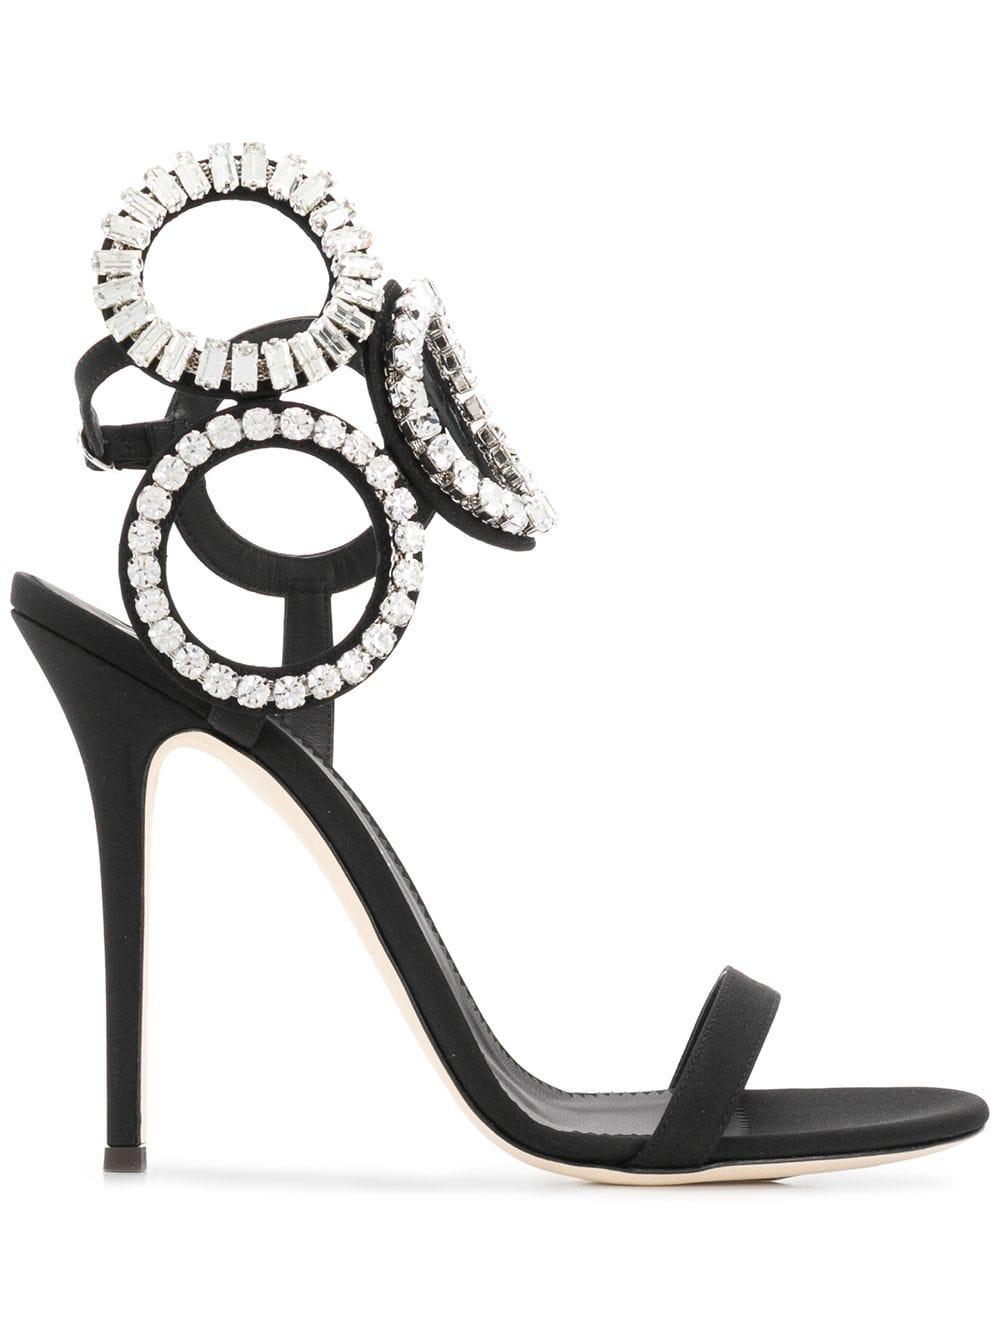 d94bc6928 Kassie Crystal Black Sandal - GIUSEPPE ZANOTTI - Russocapri